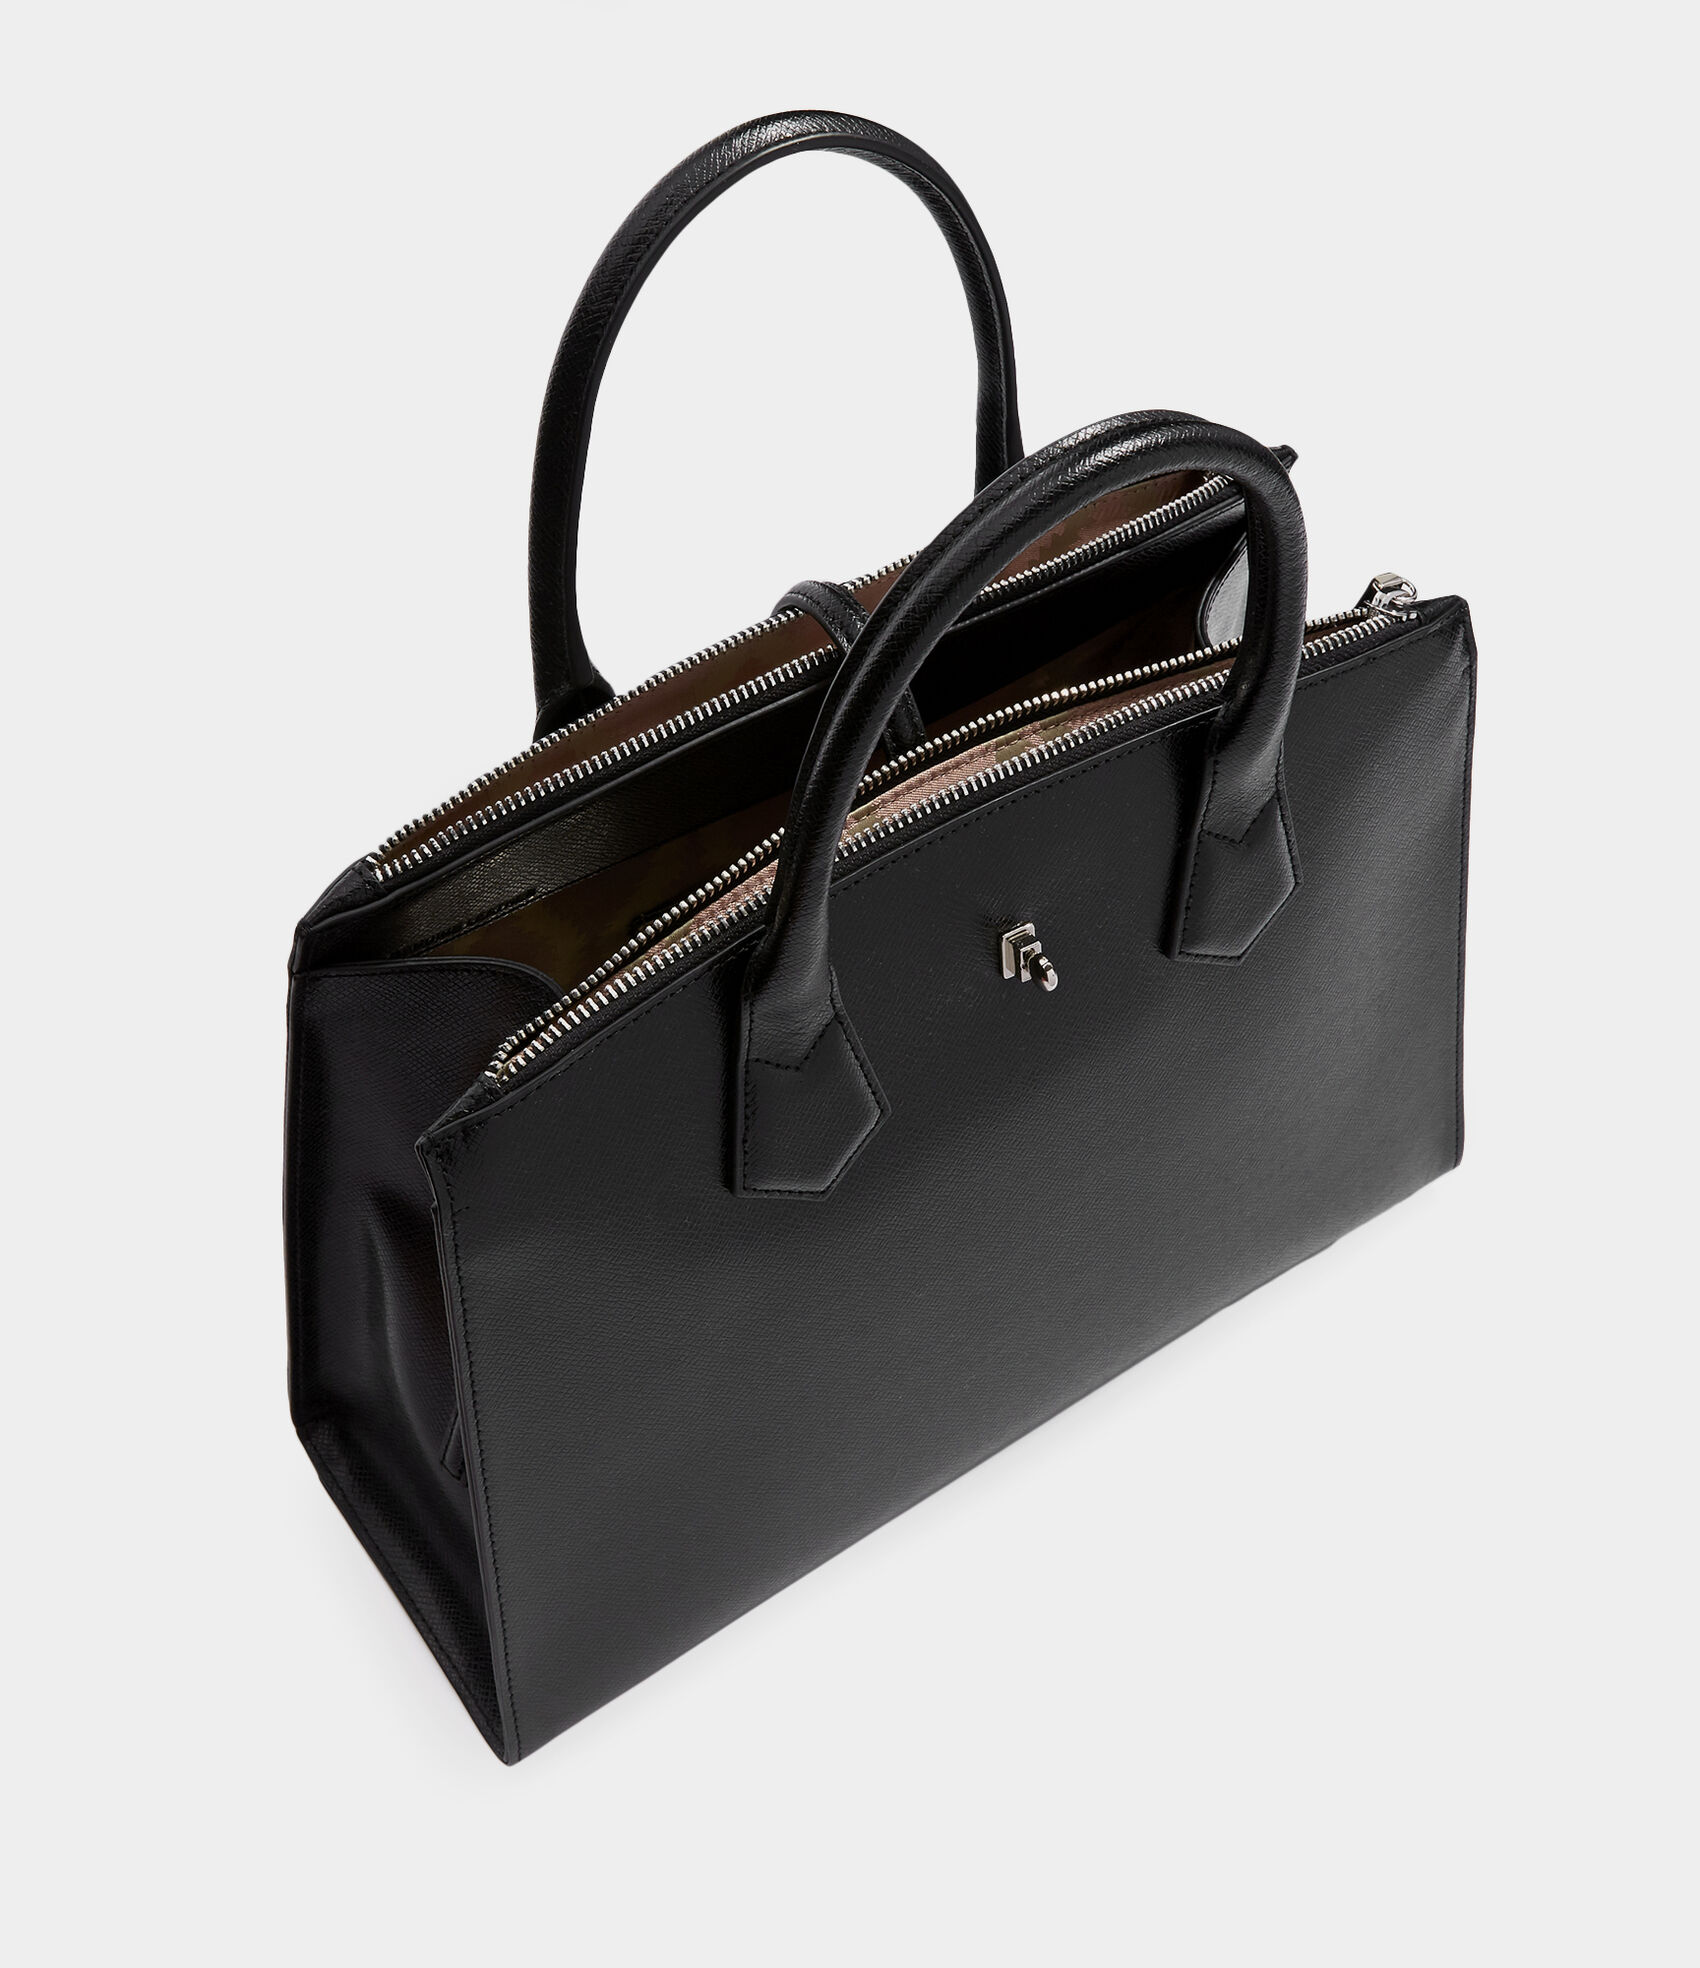 9e12cf6f36 Vivienne Westwood Women s Designer Handbags